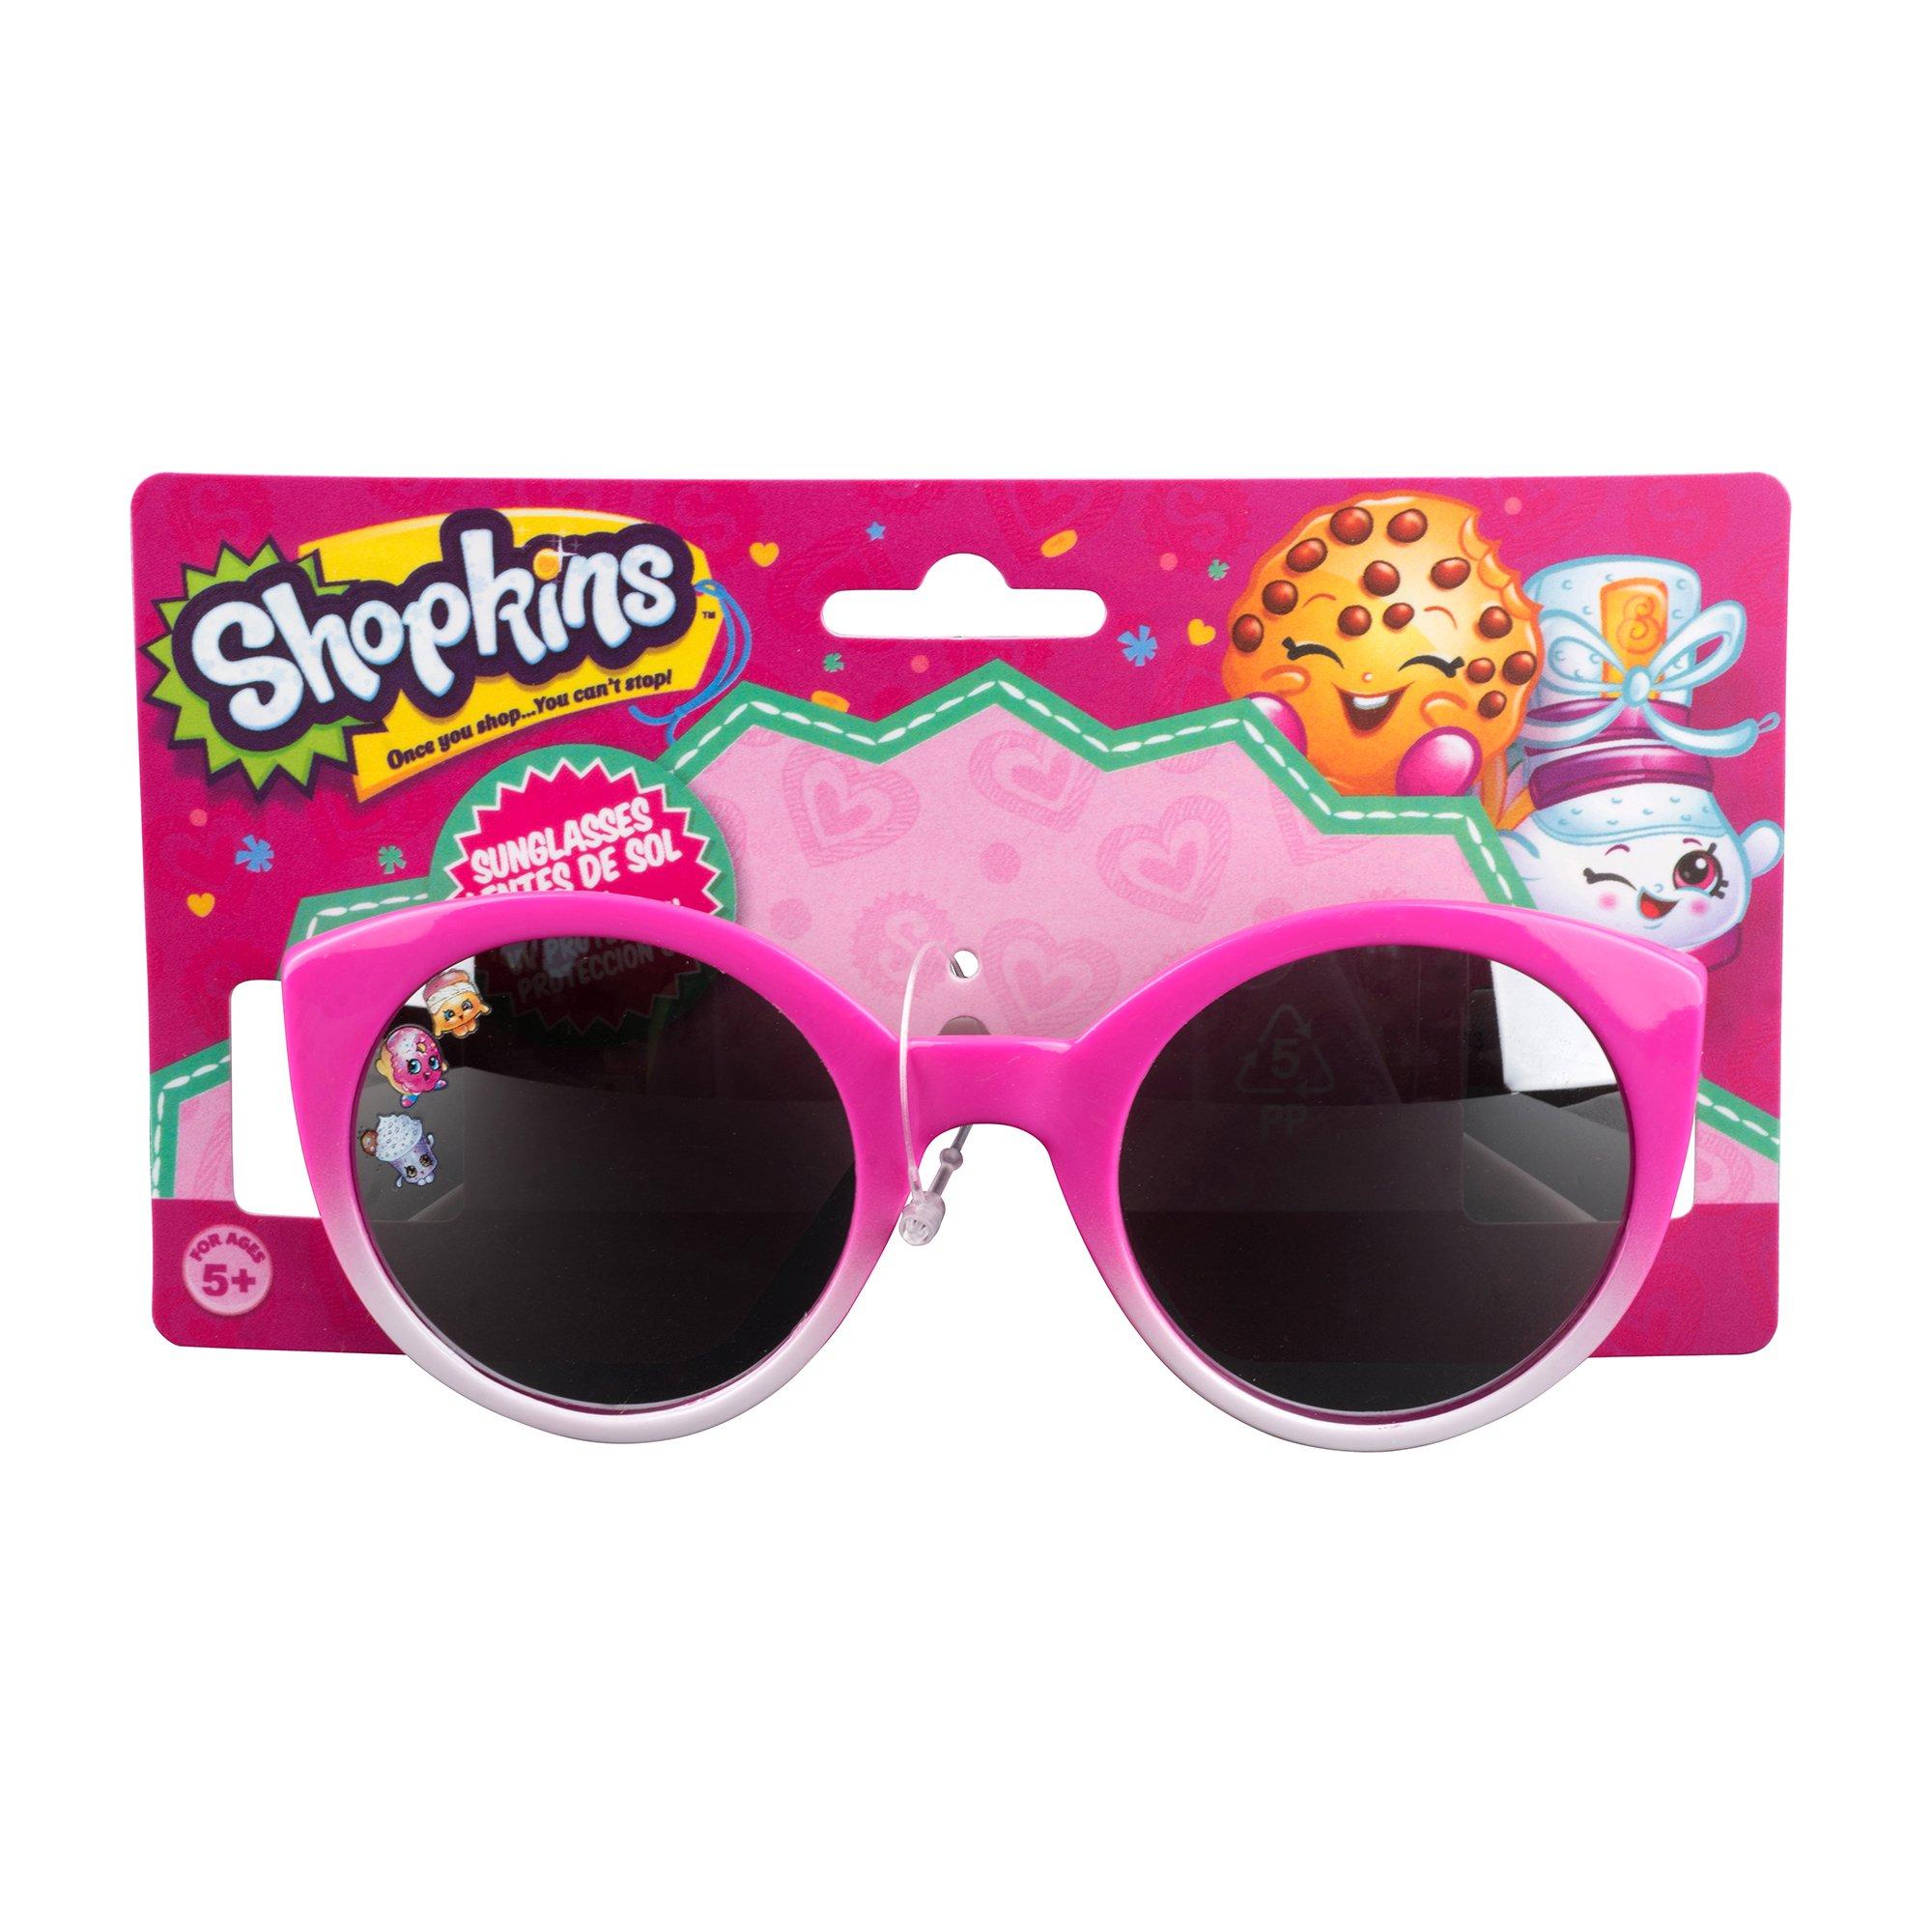 KIDS SUNGLASSES – GIRLS FASHION 100% UV SUNGLASSES, JOJO SIWA, TROLLS, SHIMMER AND SHINE, SHOPKINS, MY LITTLE PONY, PEPPA PIG